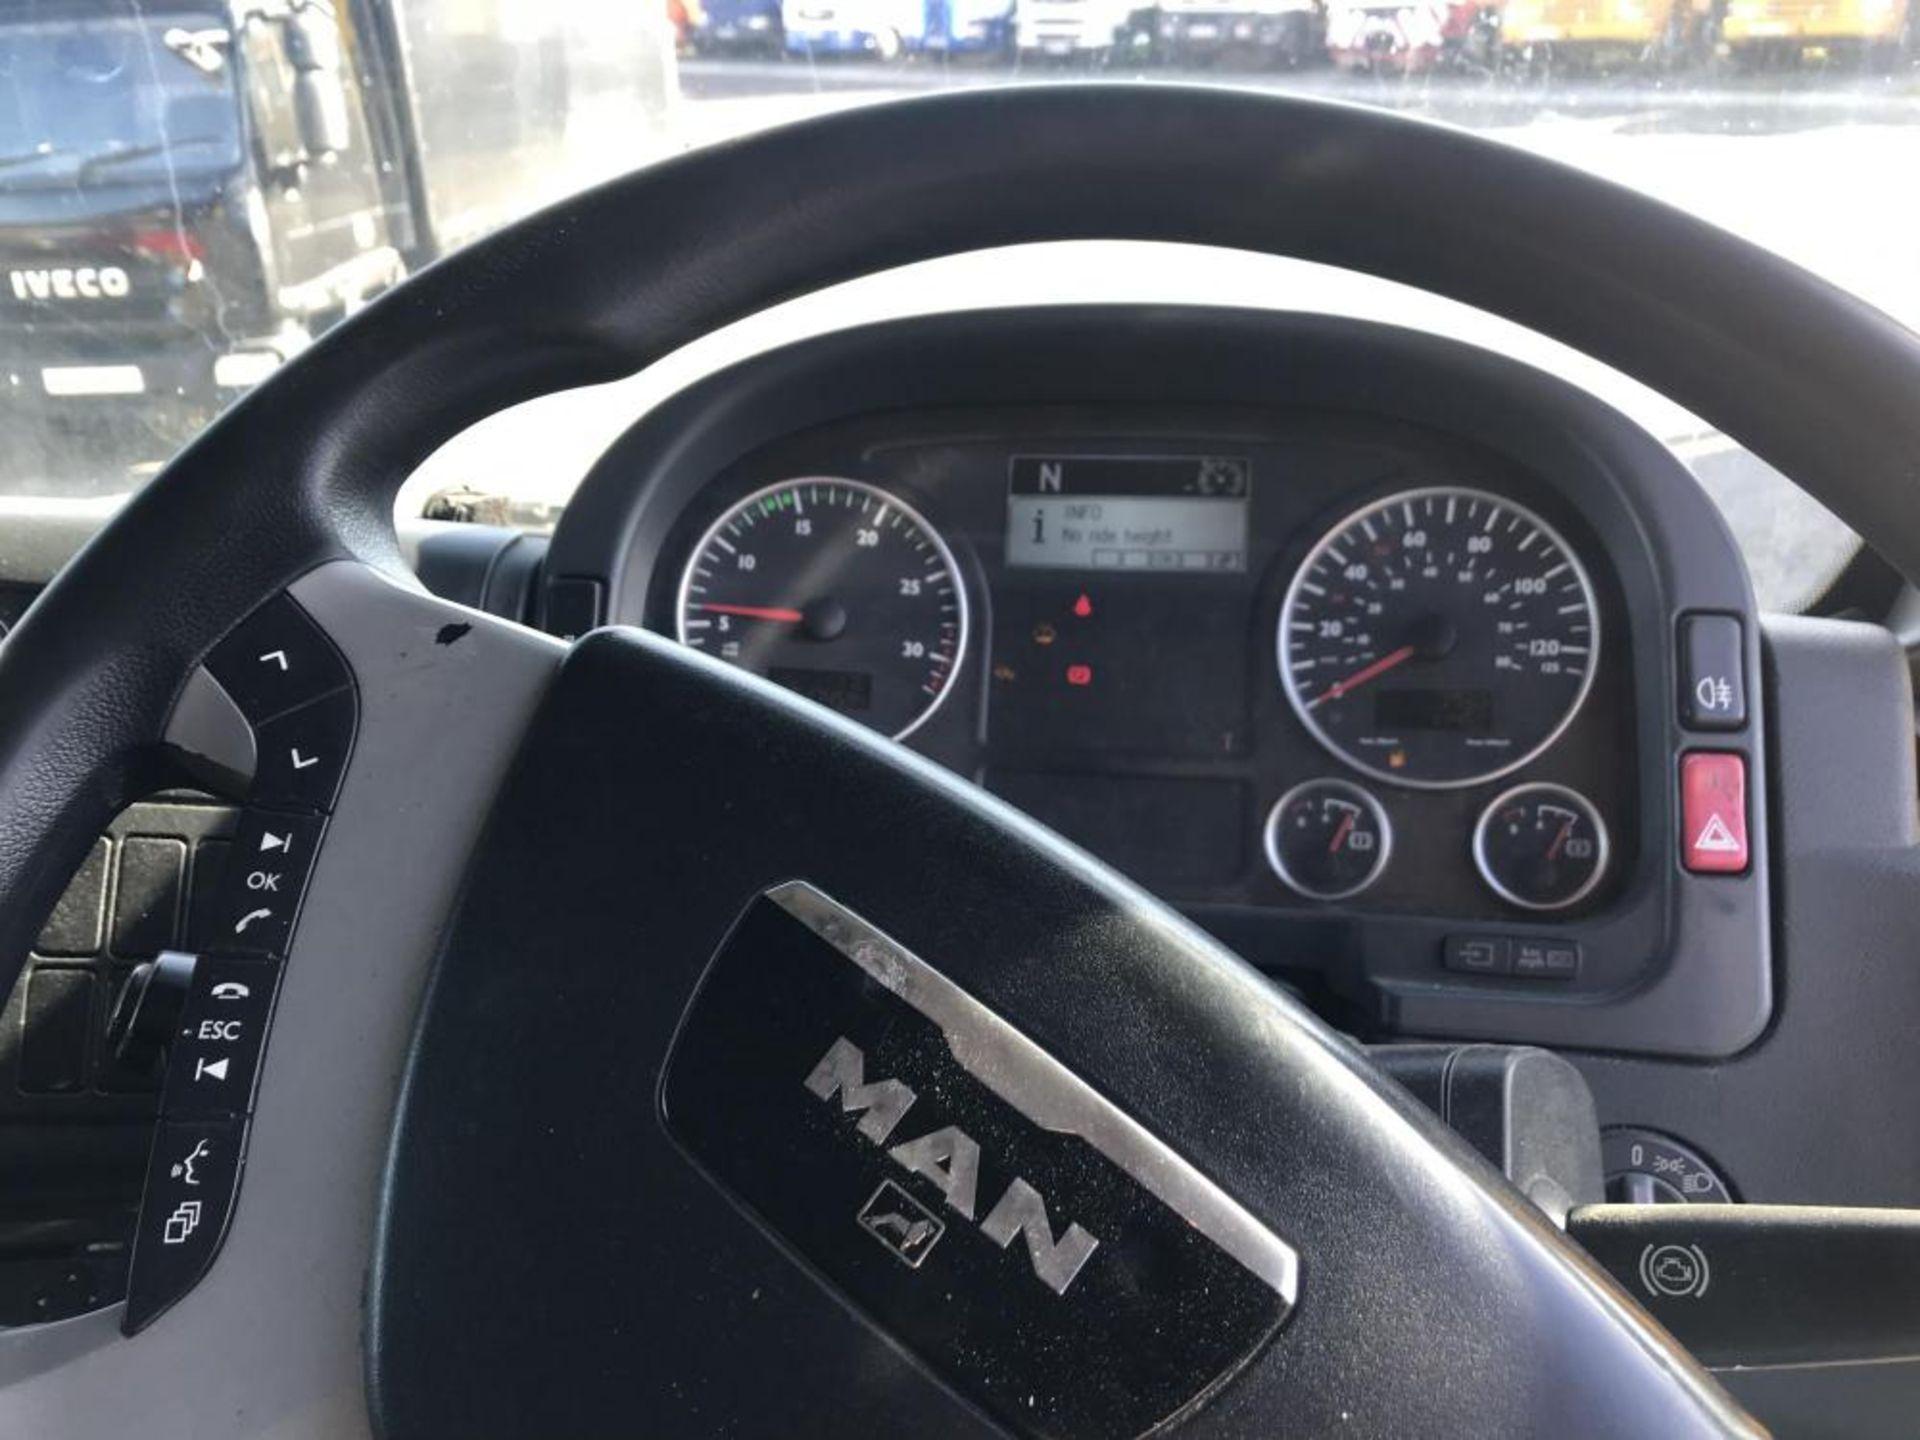 2012/12 REG MAN TG-M 18.250 4X2 LL L 6.9L DIESEL SLEEPER CAB AUTO GEARBOX GOOD CONDITION *PLUS VAT* - Image 10 of 15